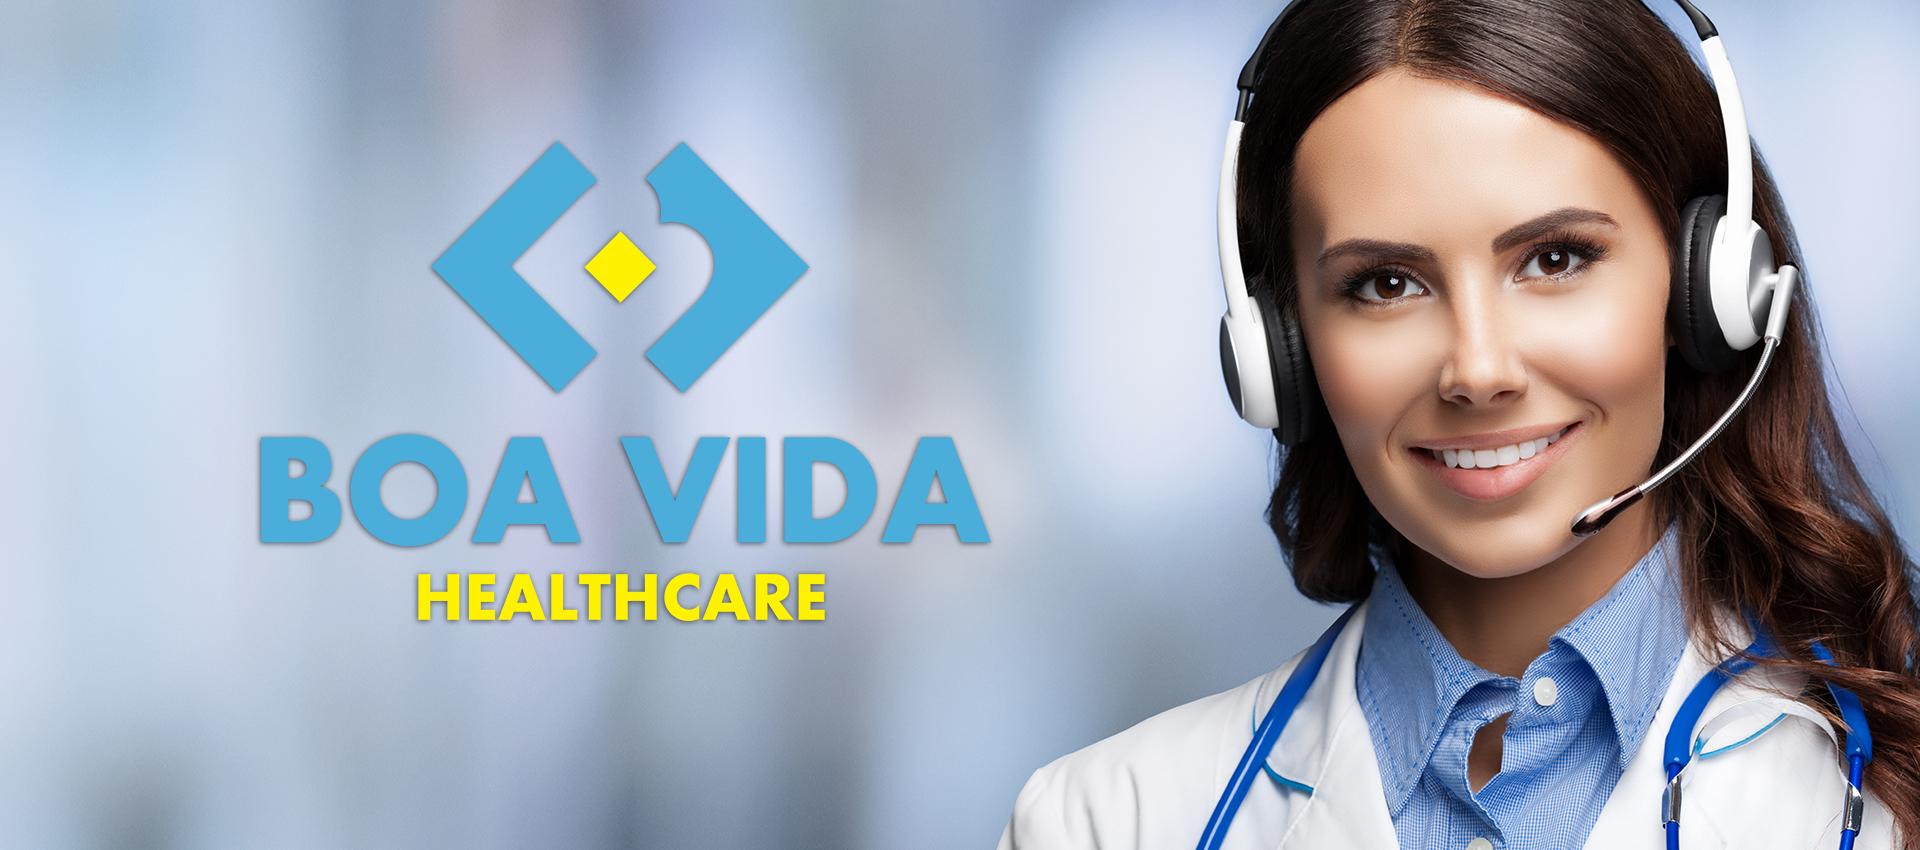 Contact Boa Vida Healthcare